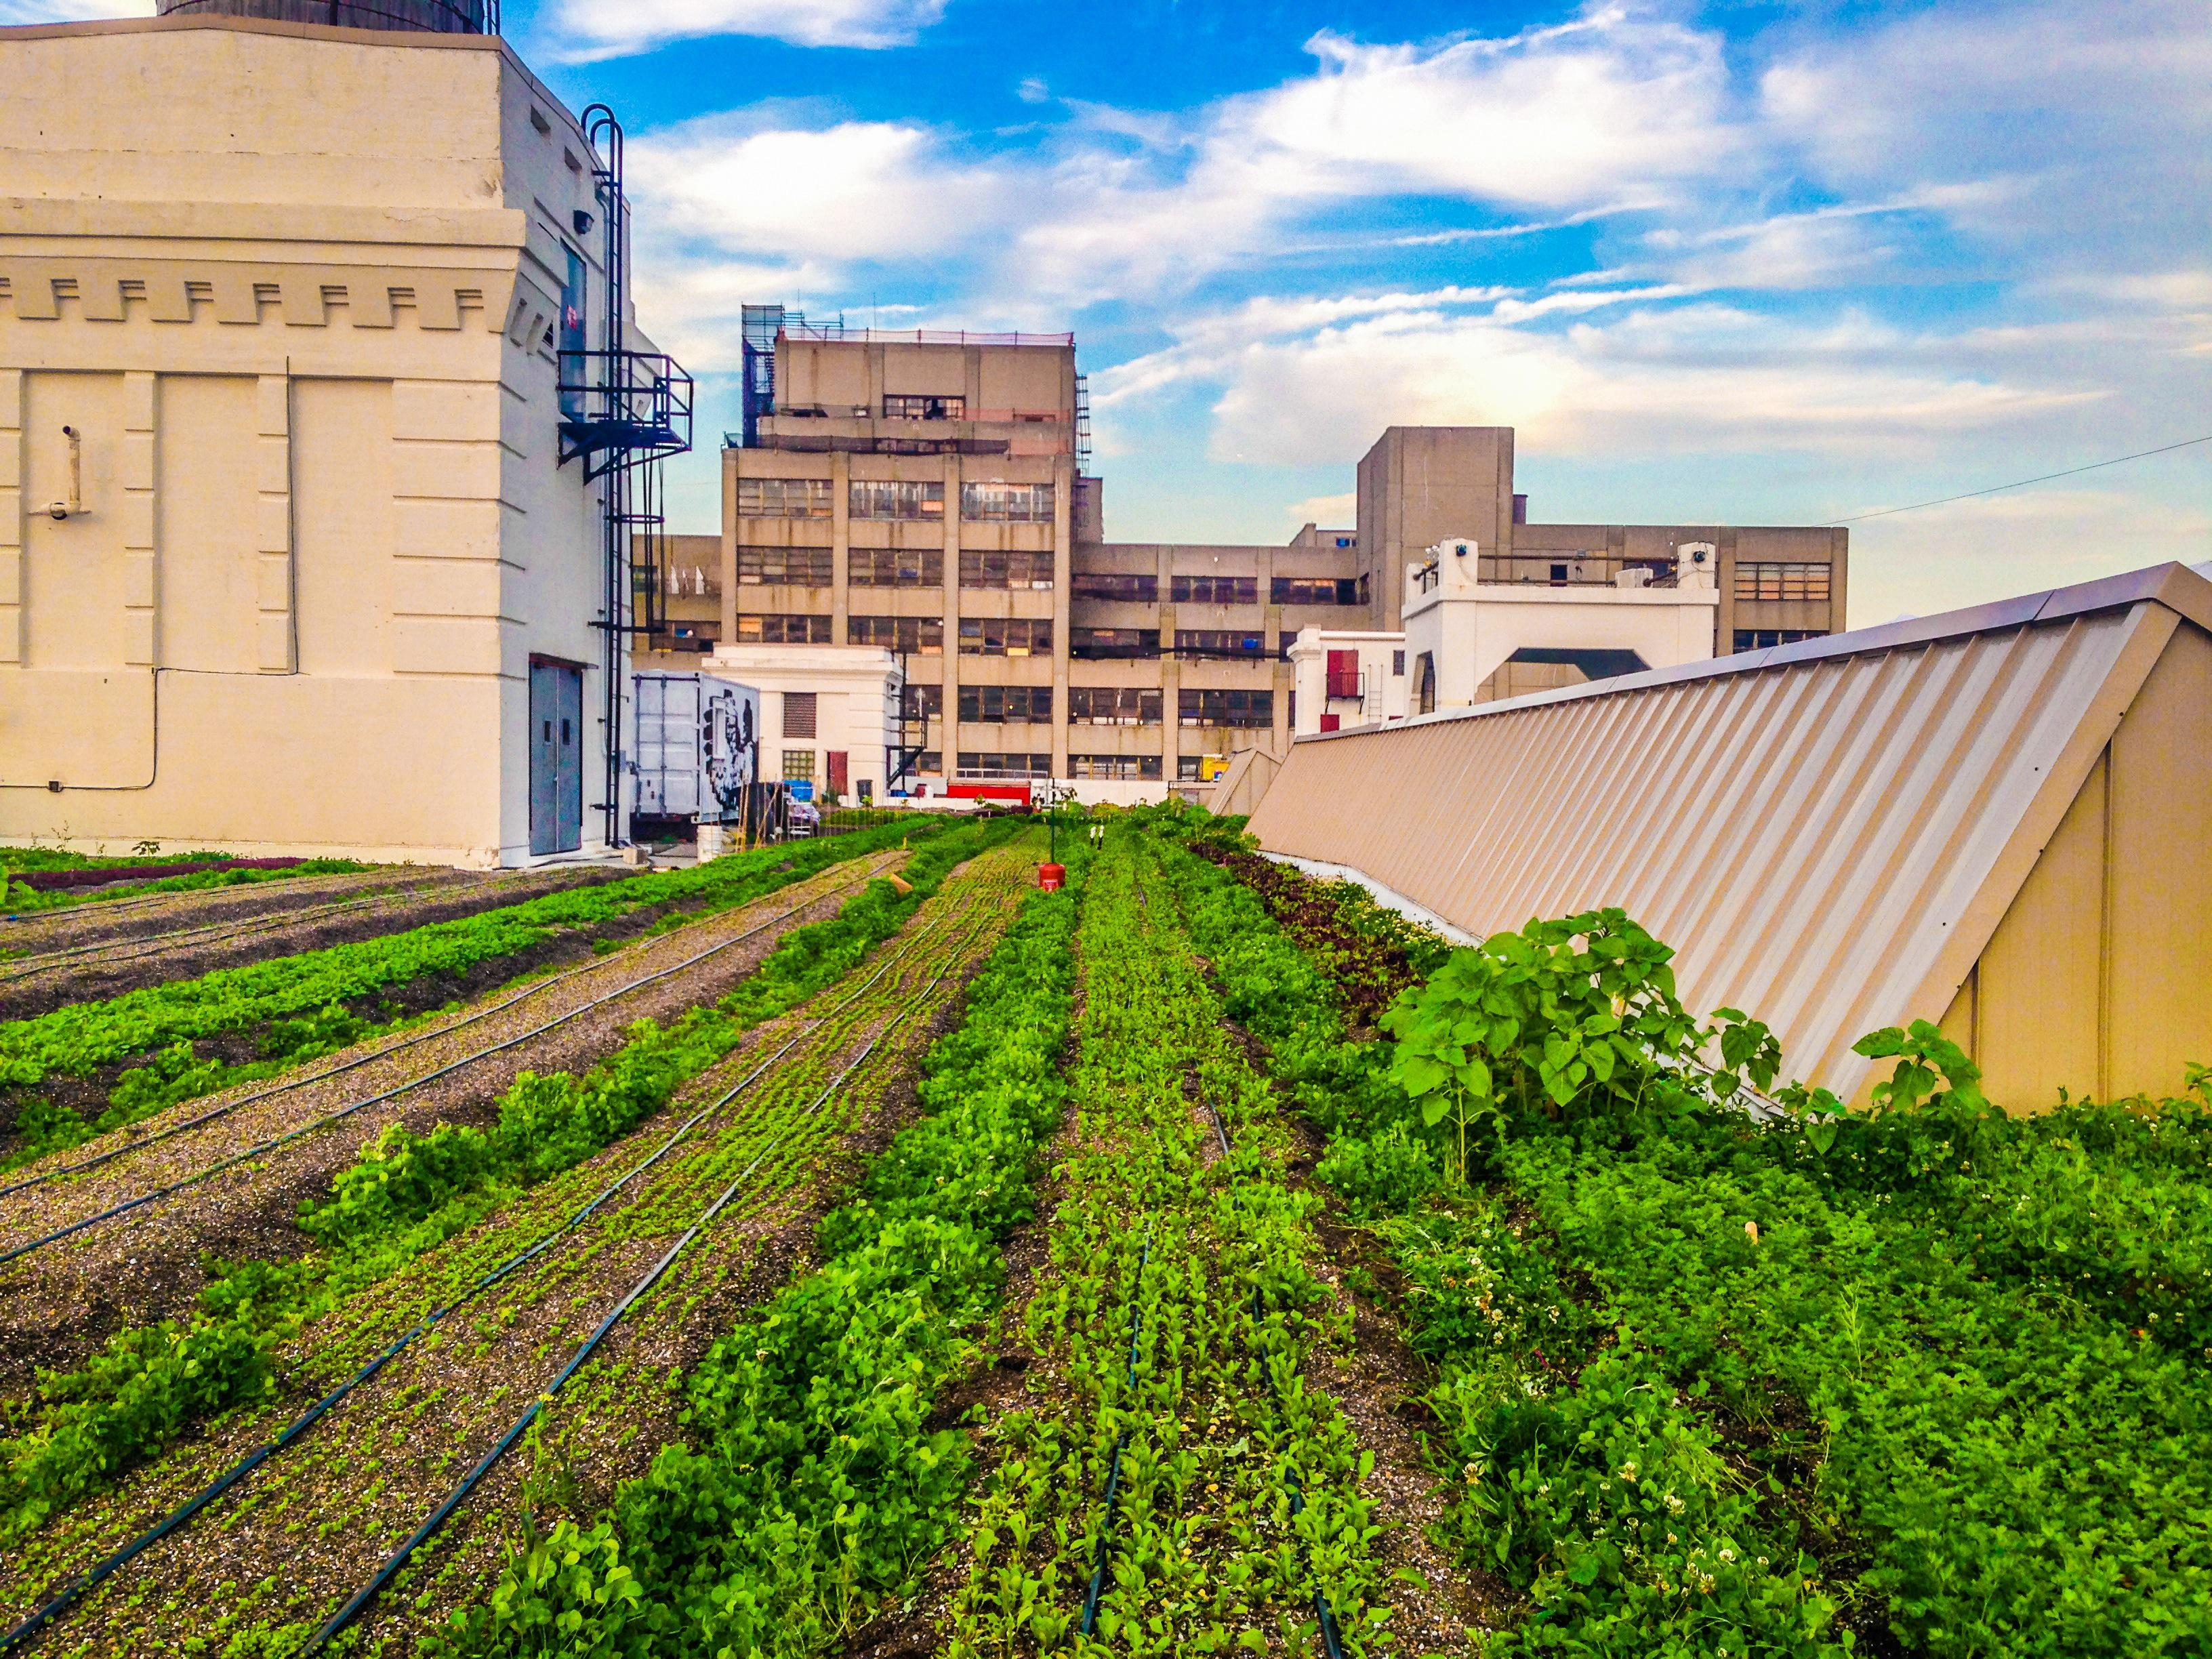 Brooklyn Grange Urban Rooftop Farming Natalie Vie